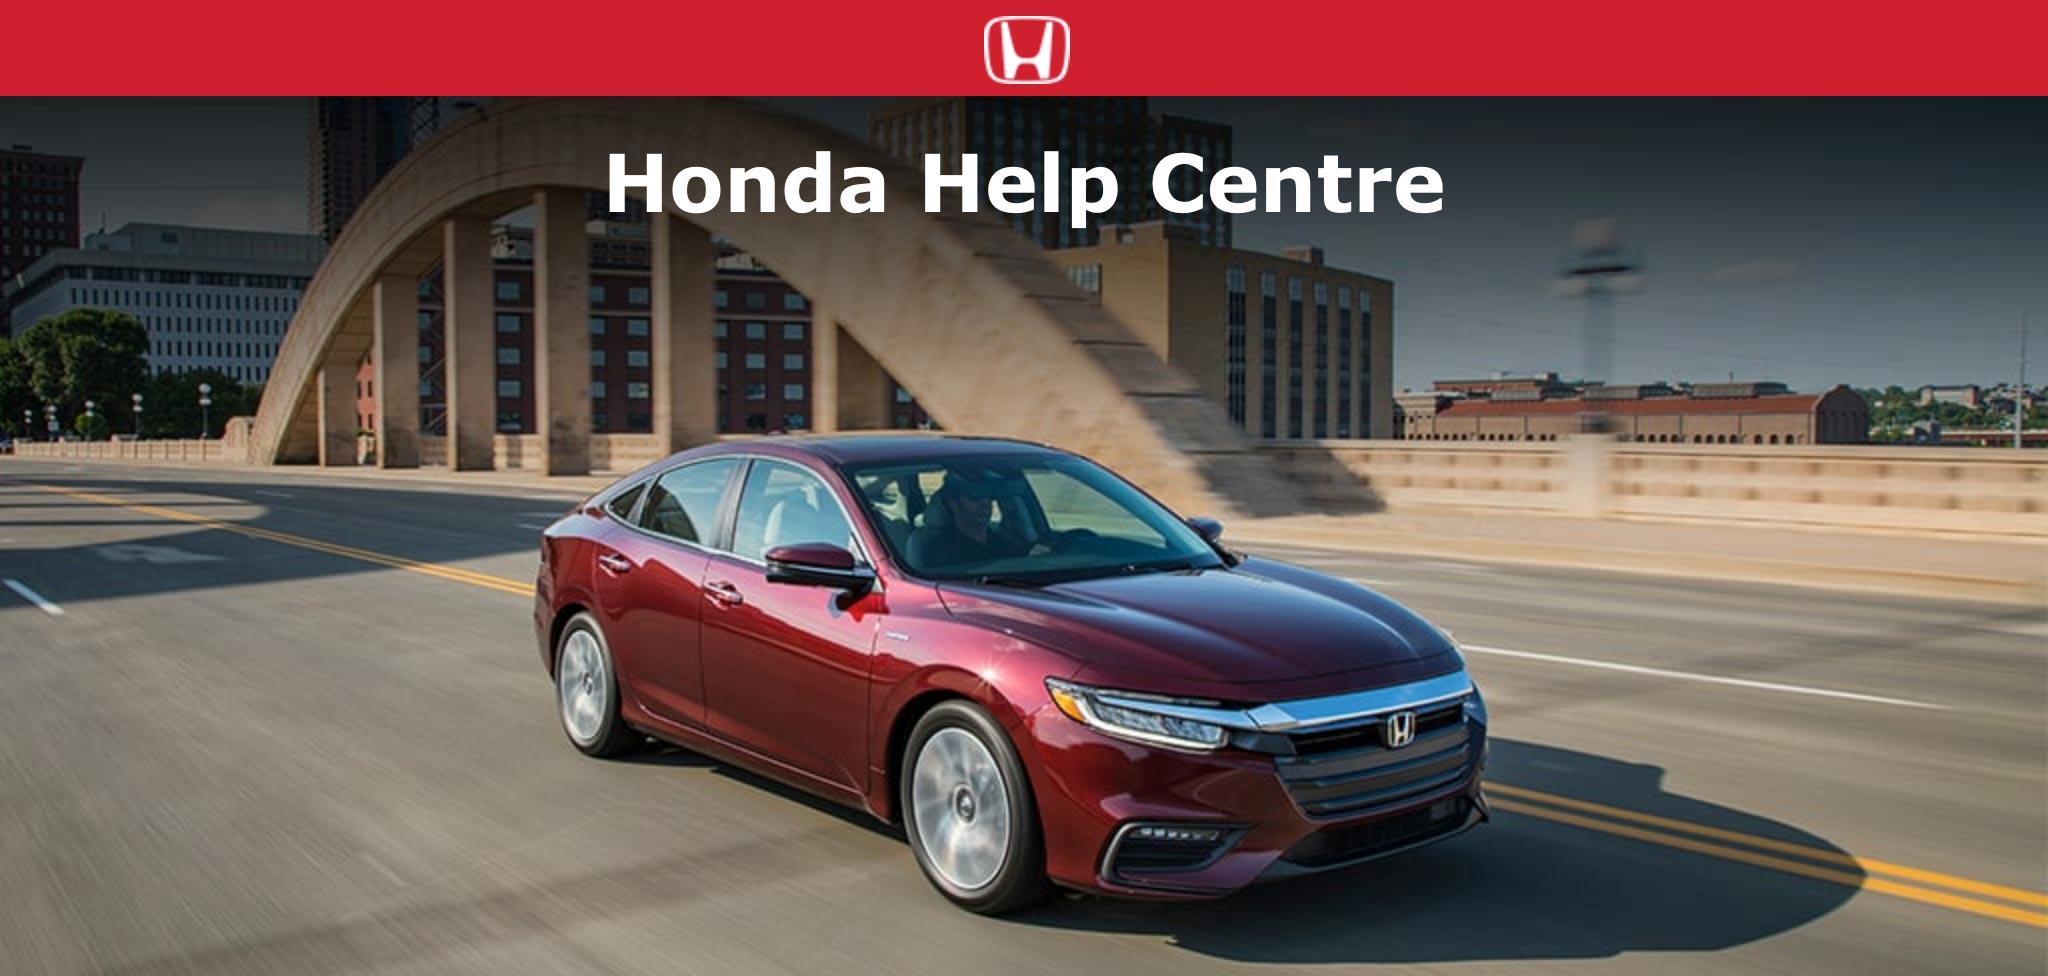 Gore Motors Honda Vehicle Resources